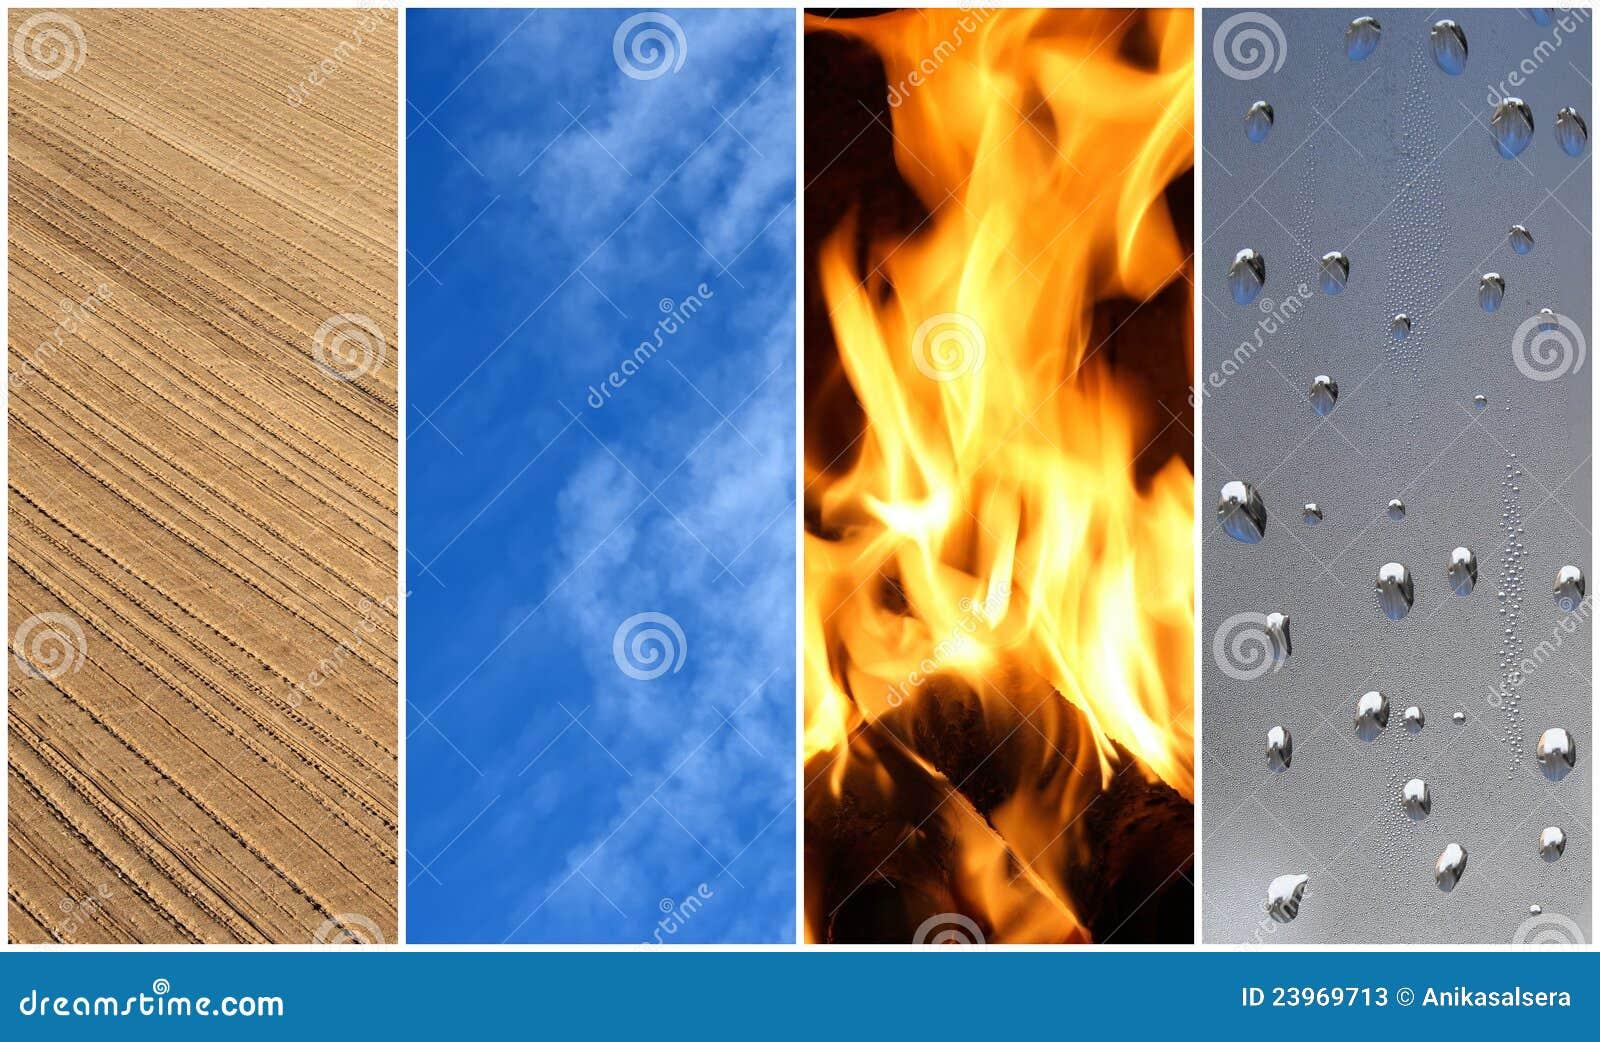 Quattro elementi. Terra, aria, fuoco, acqua.